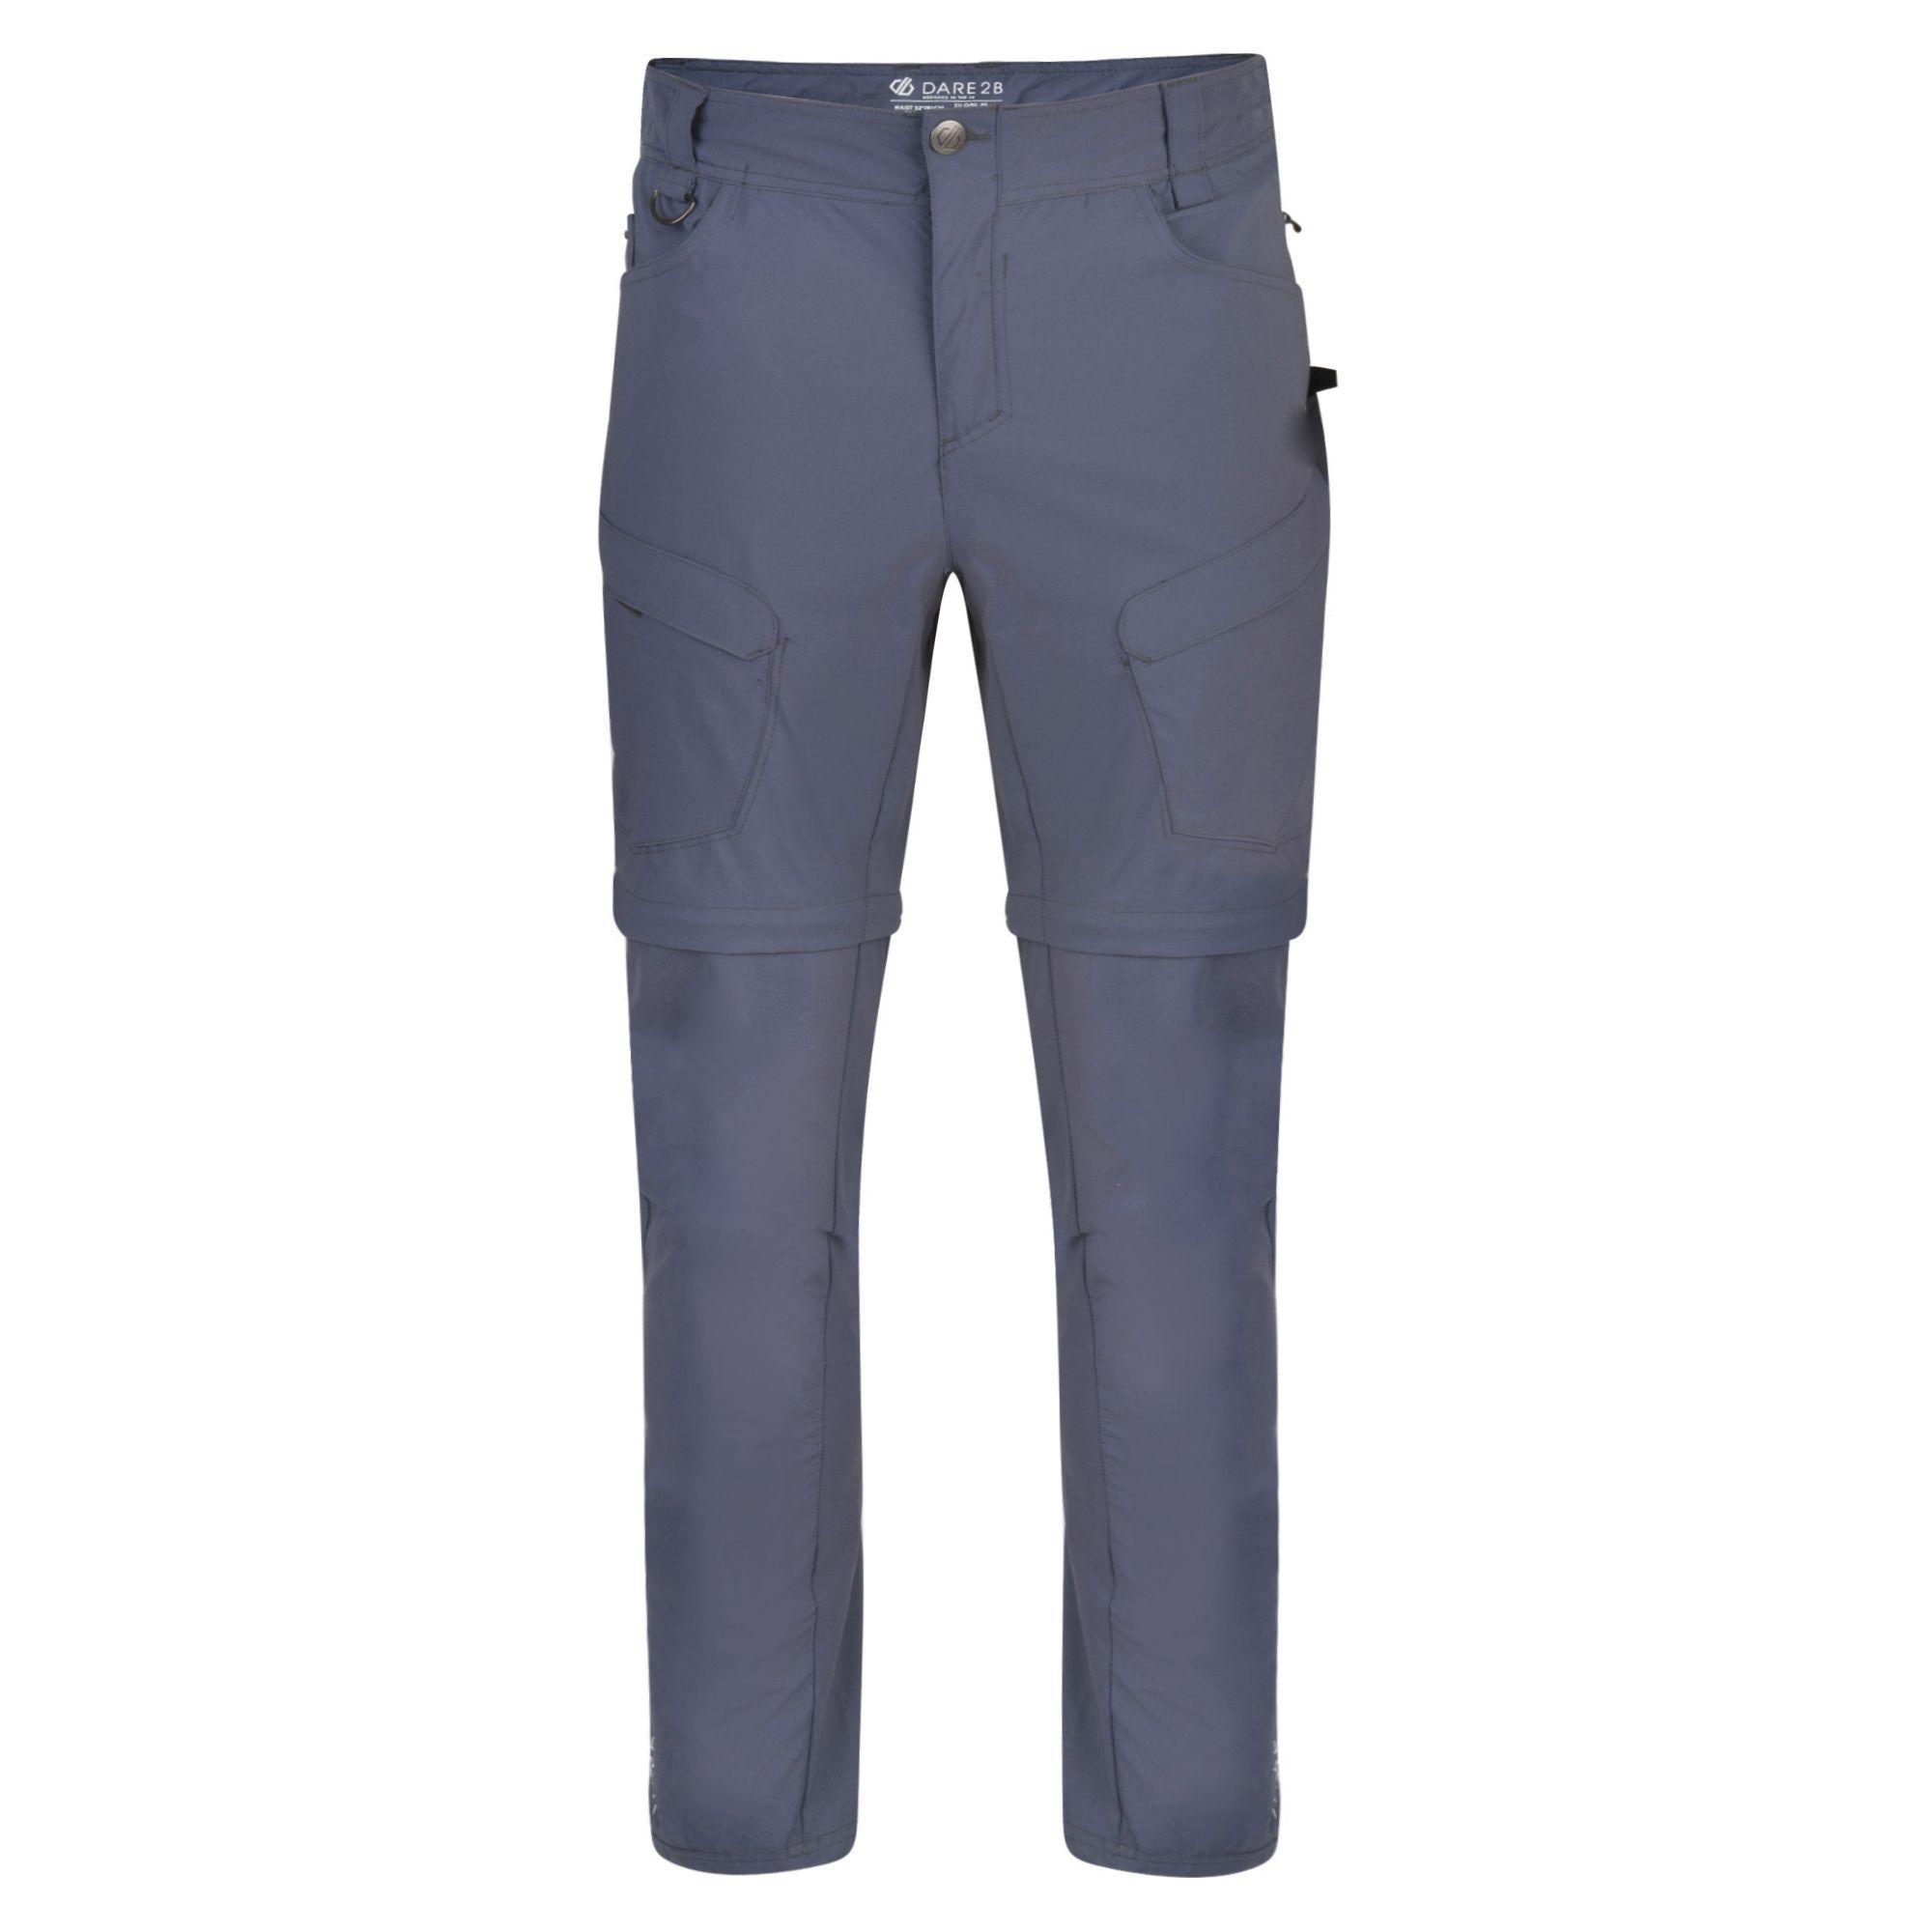 Dare 2B Mens Tuned In II Multi Pocket Zip Off Walking Trousers